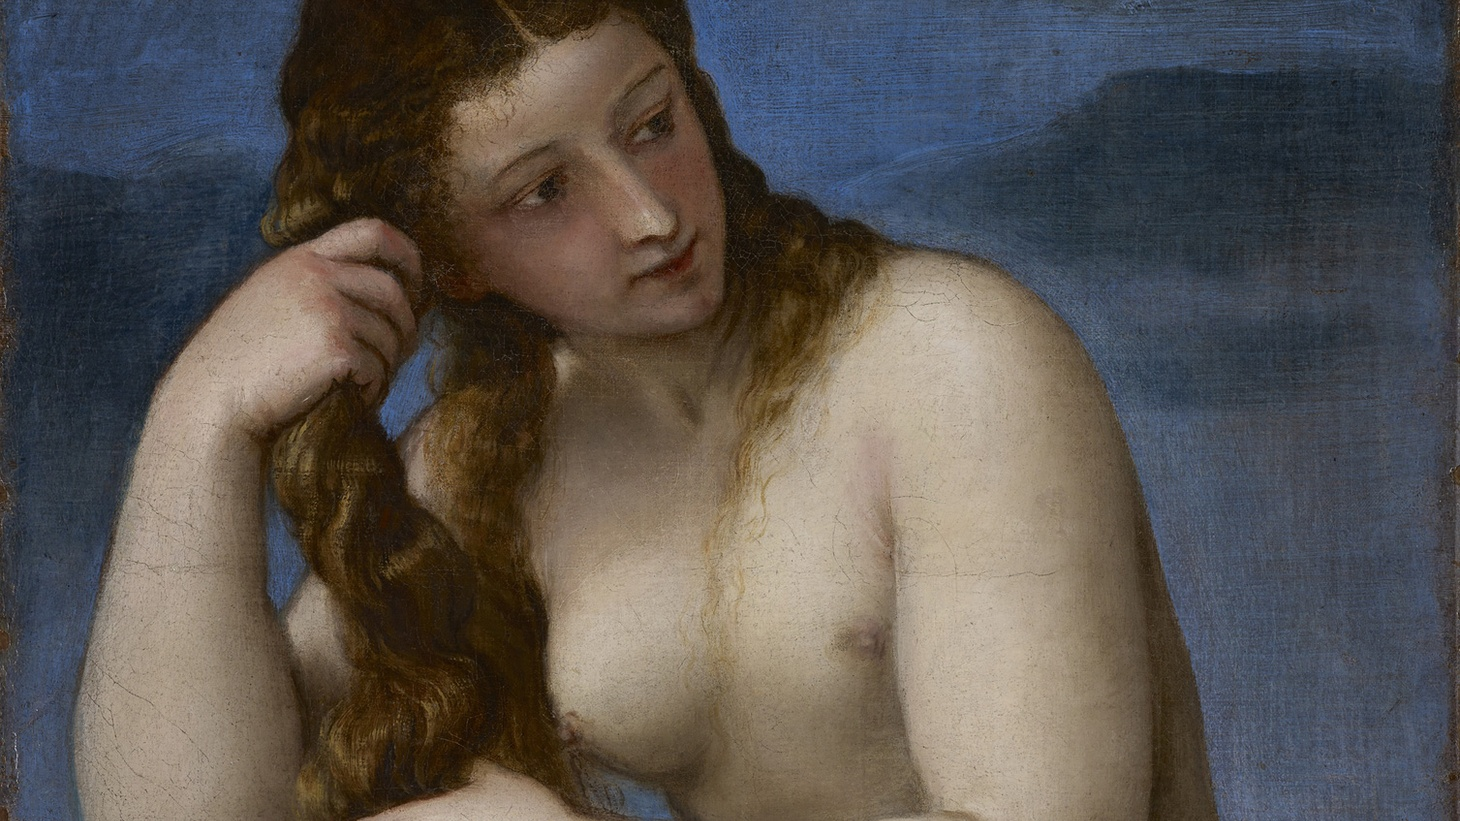 Nude art stars